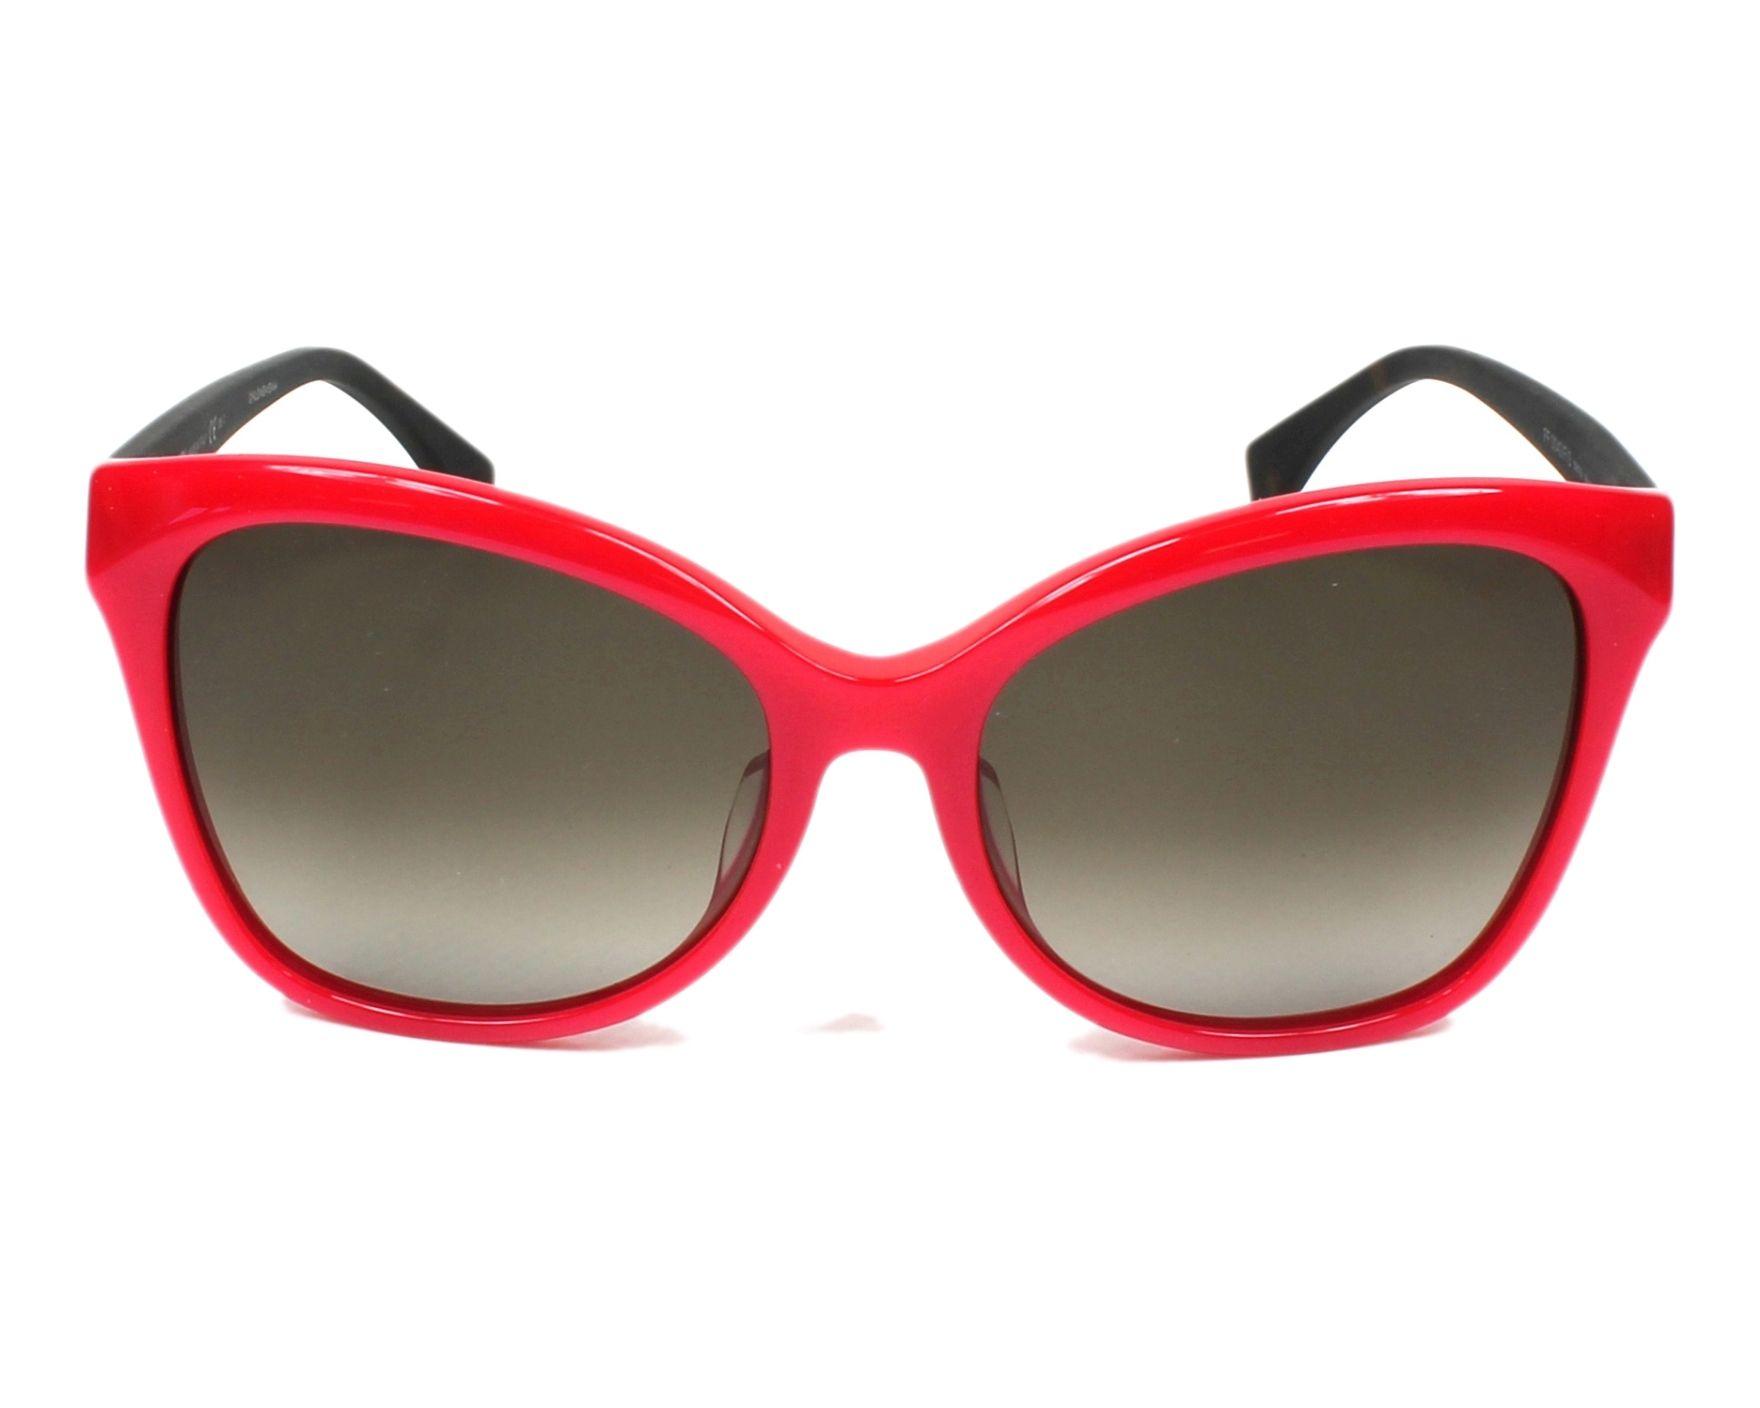 ef38ce4448 Fendi Sunglasses Pink Frame